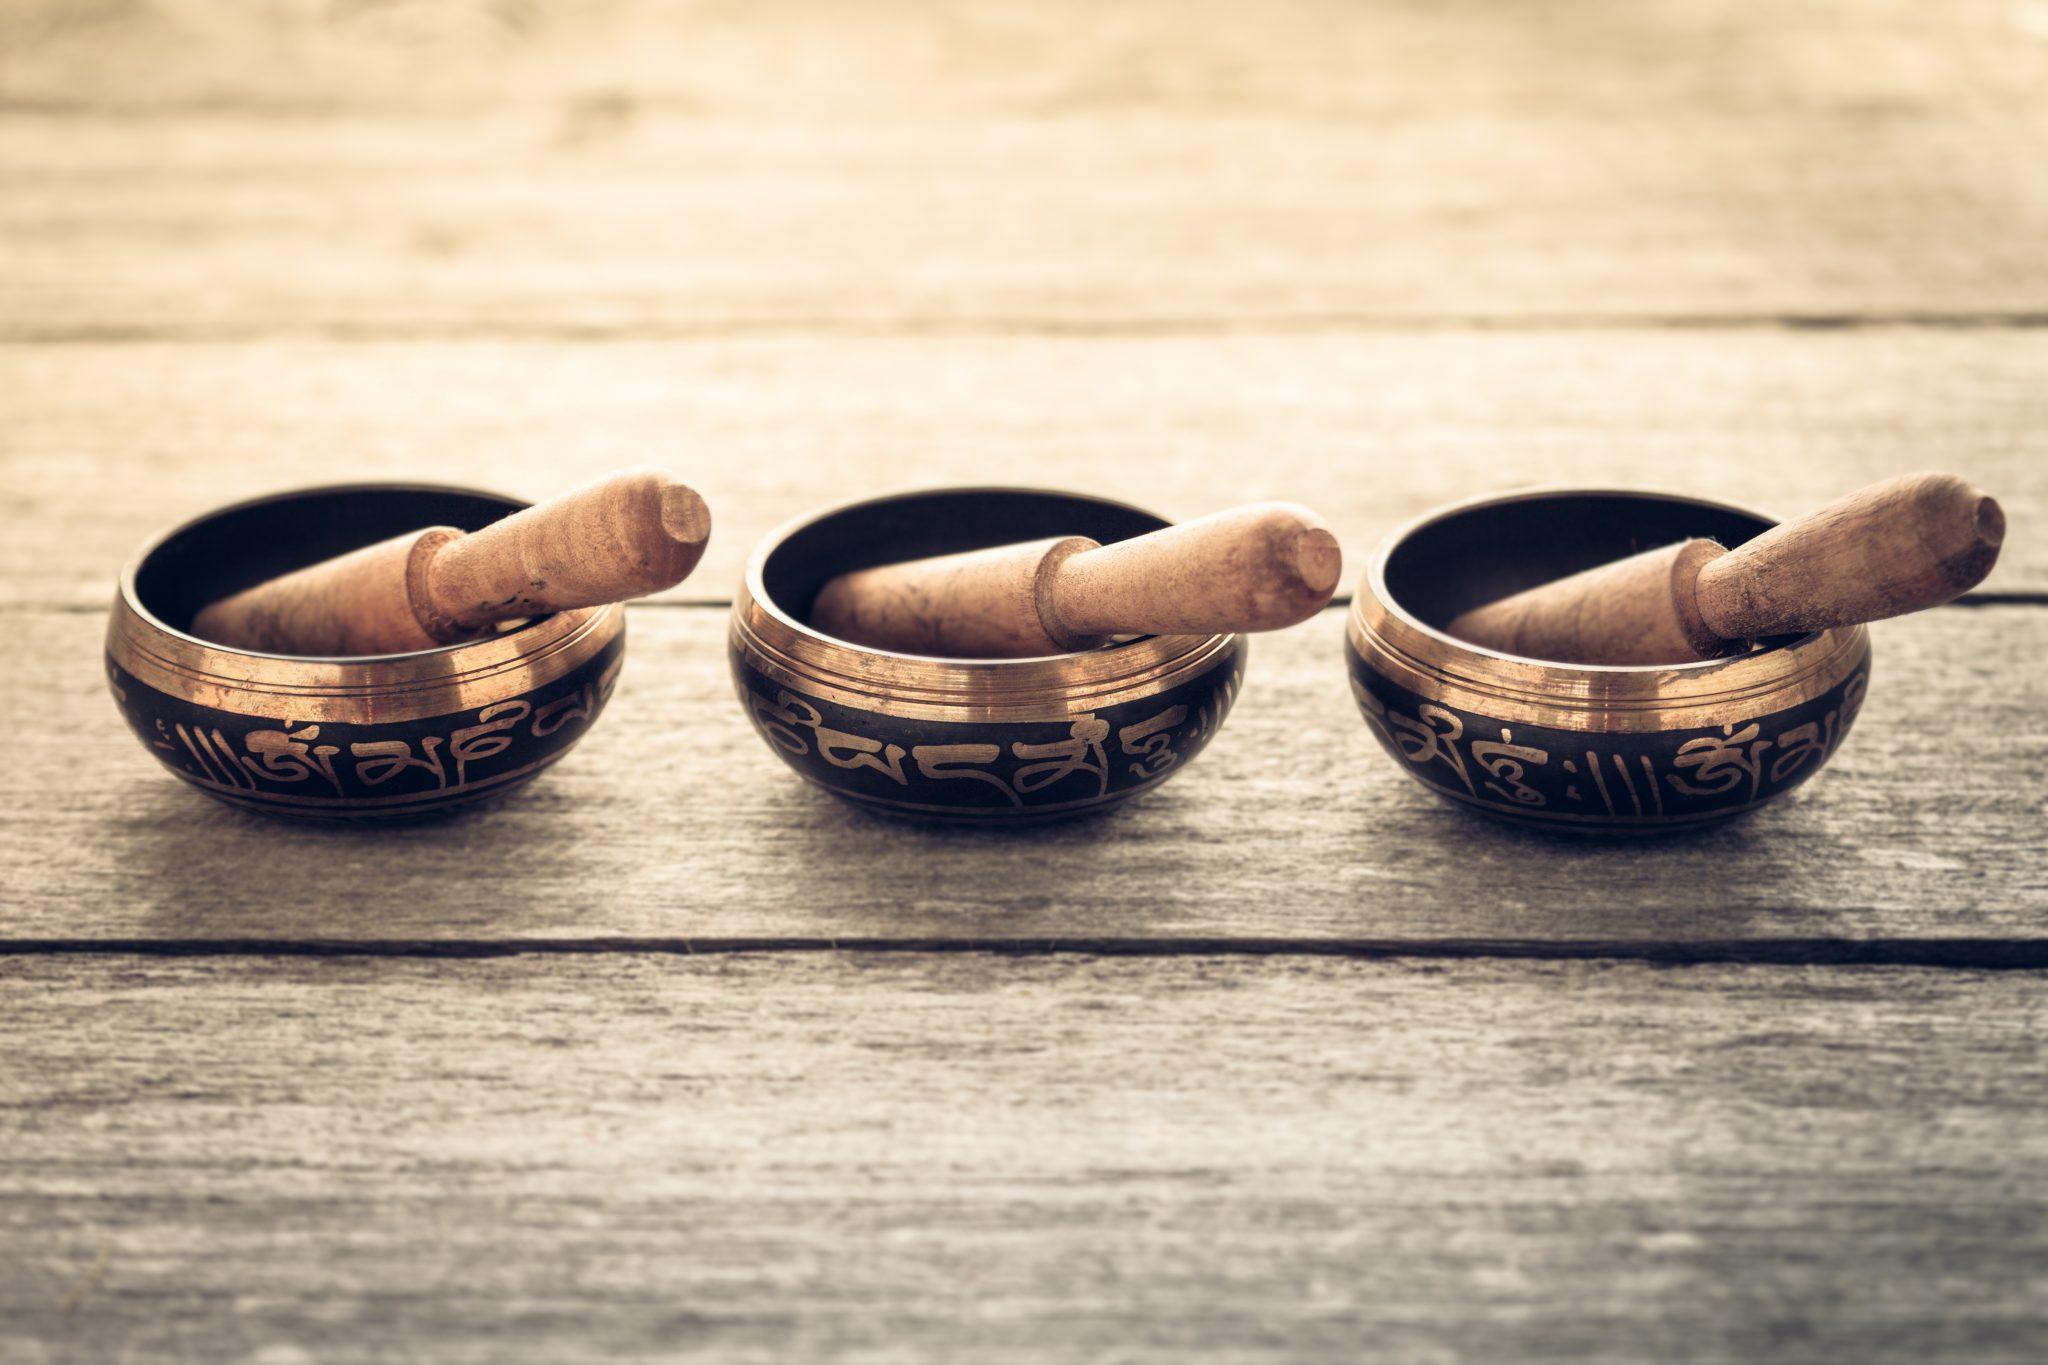 Singing Bowls - High Quality Meditation Bowls